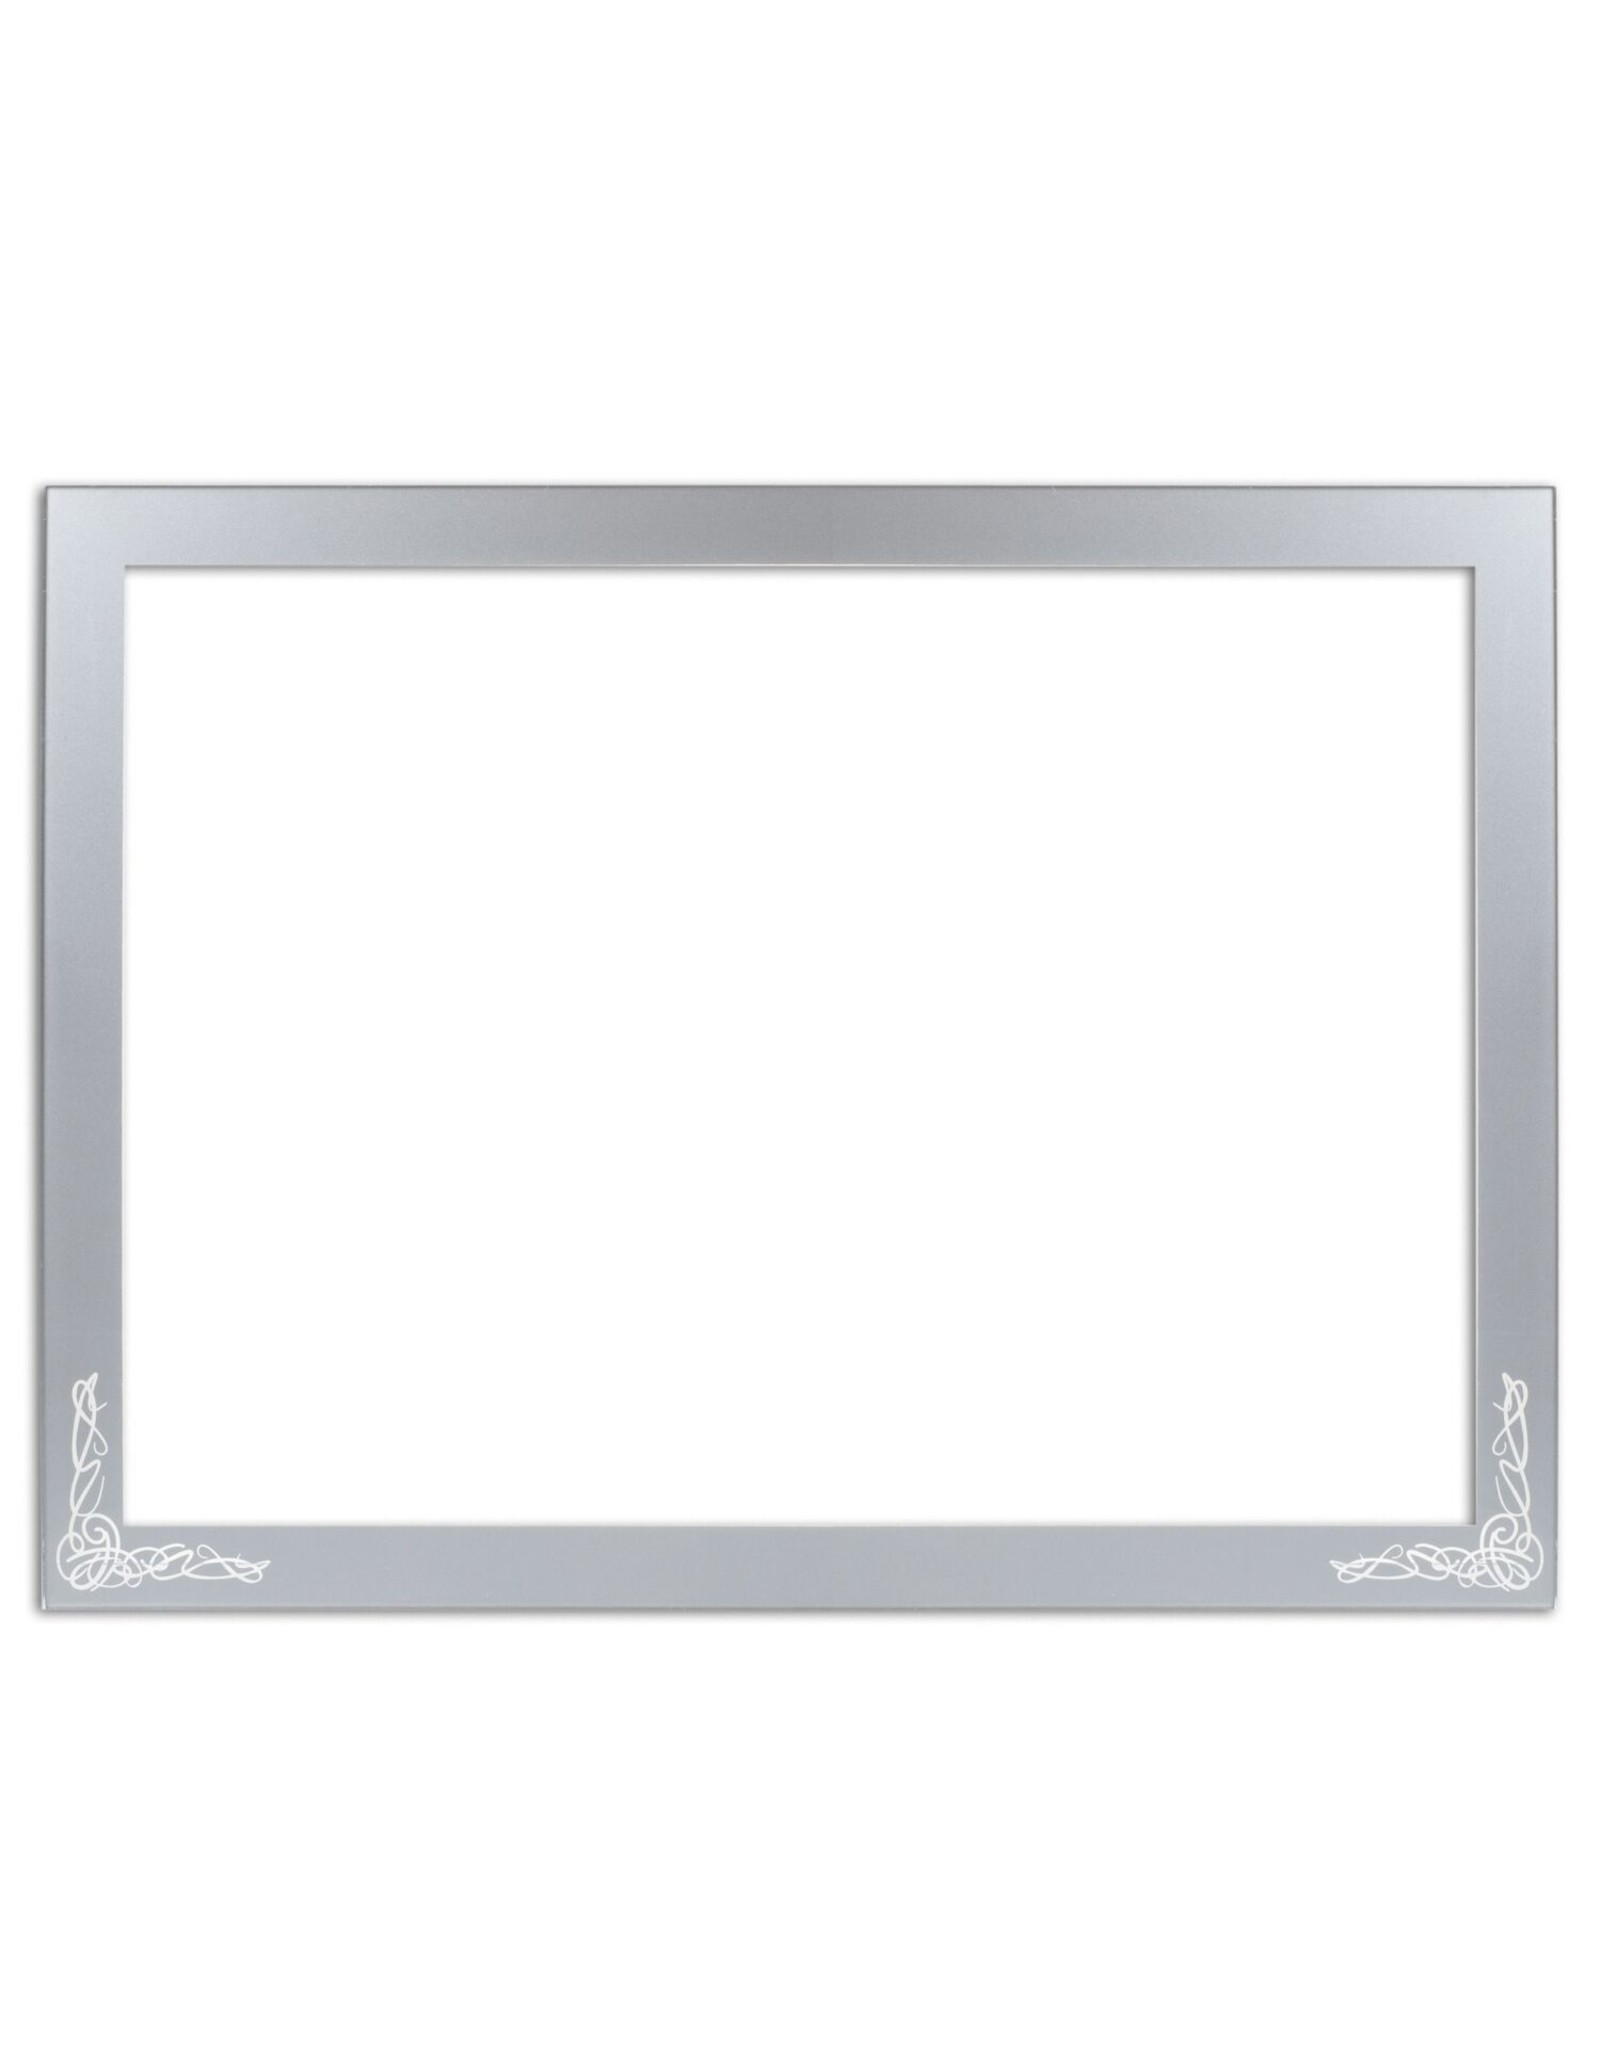 Presented Touch Chanukah Menorah/Leichter Tray Cornered Design Design Clear Silver